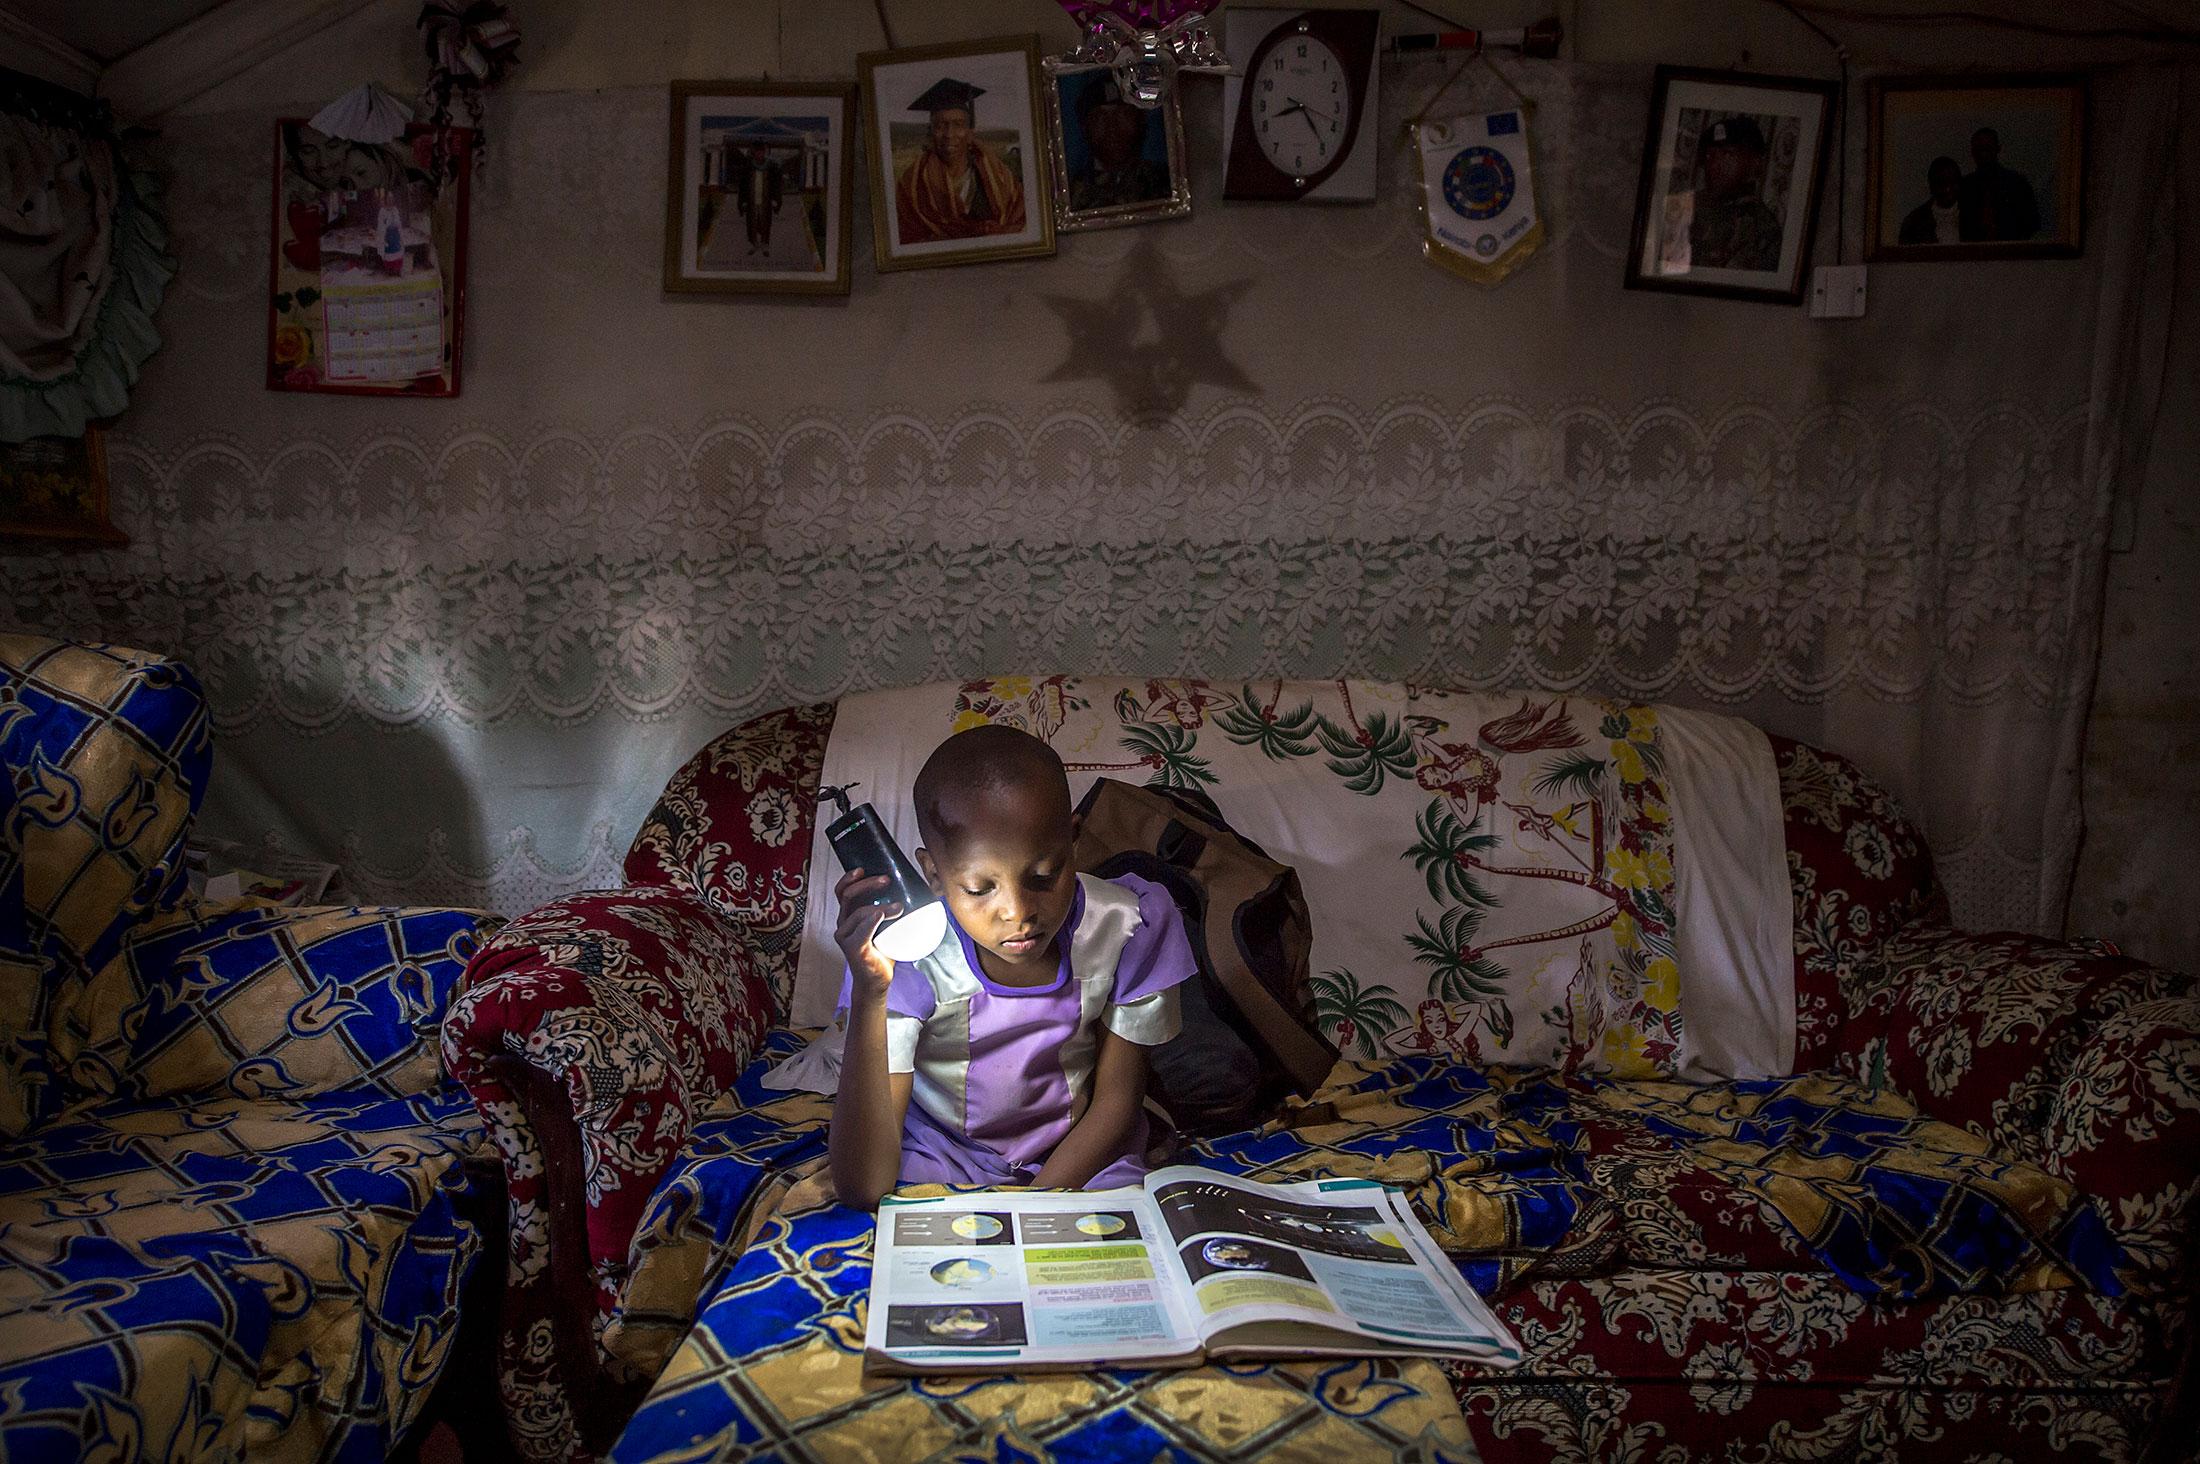 A Nairobi schoolgirl studying at night.